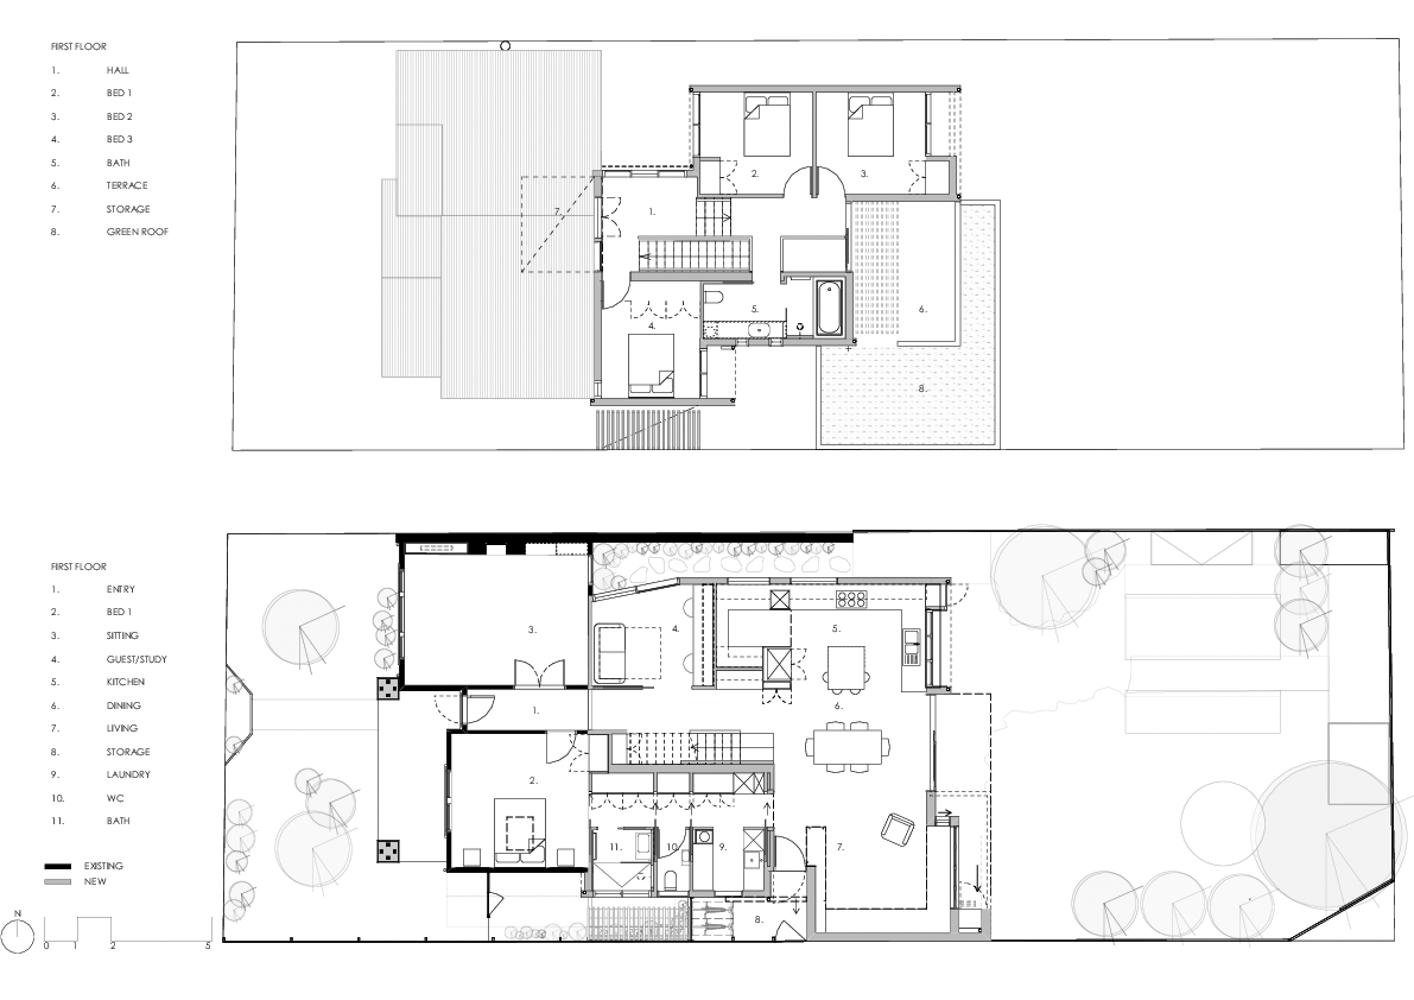 Home extension floor plan